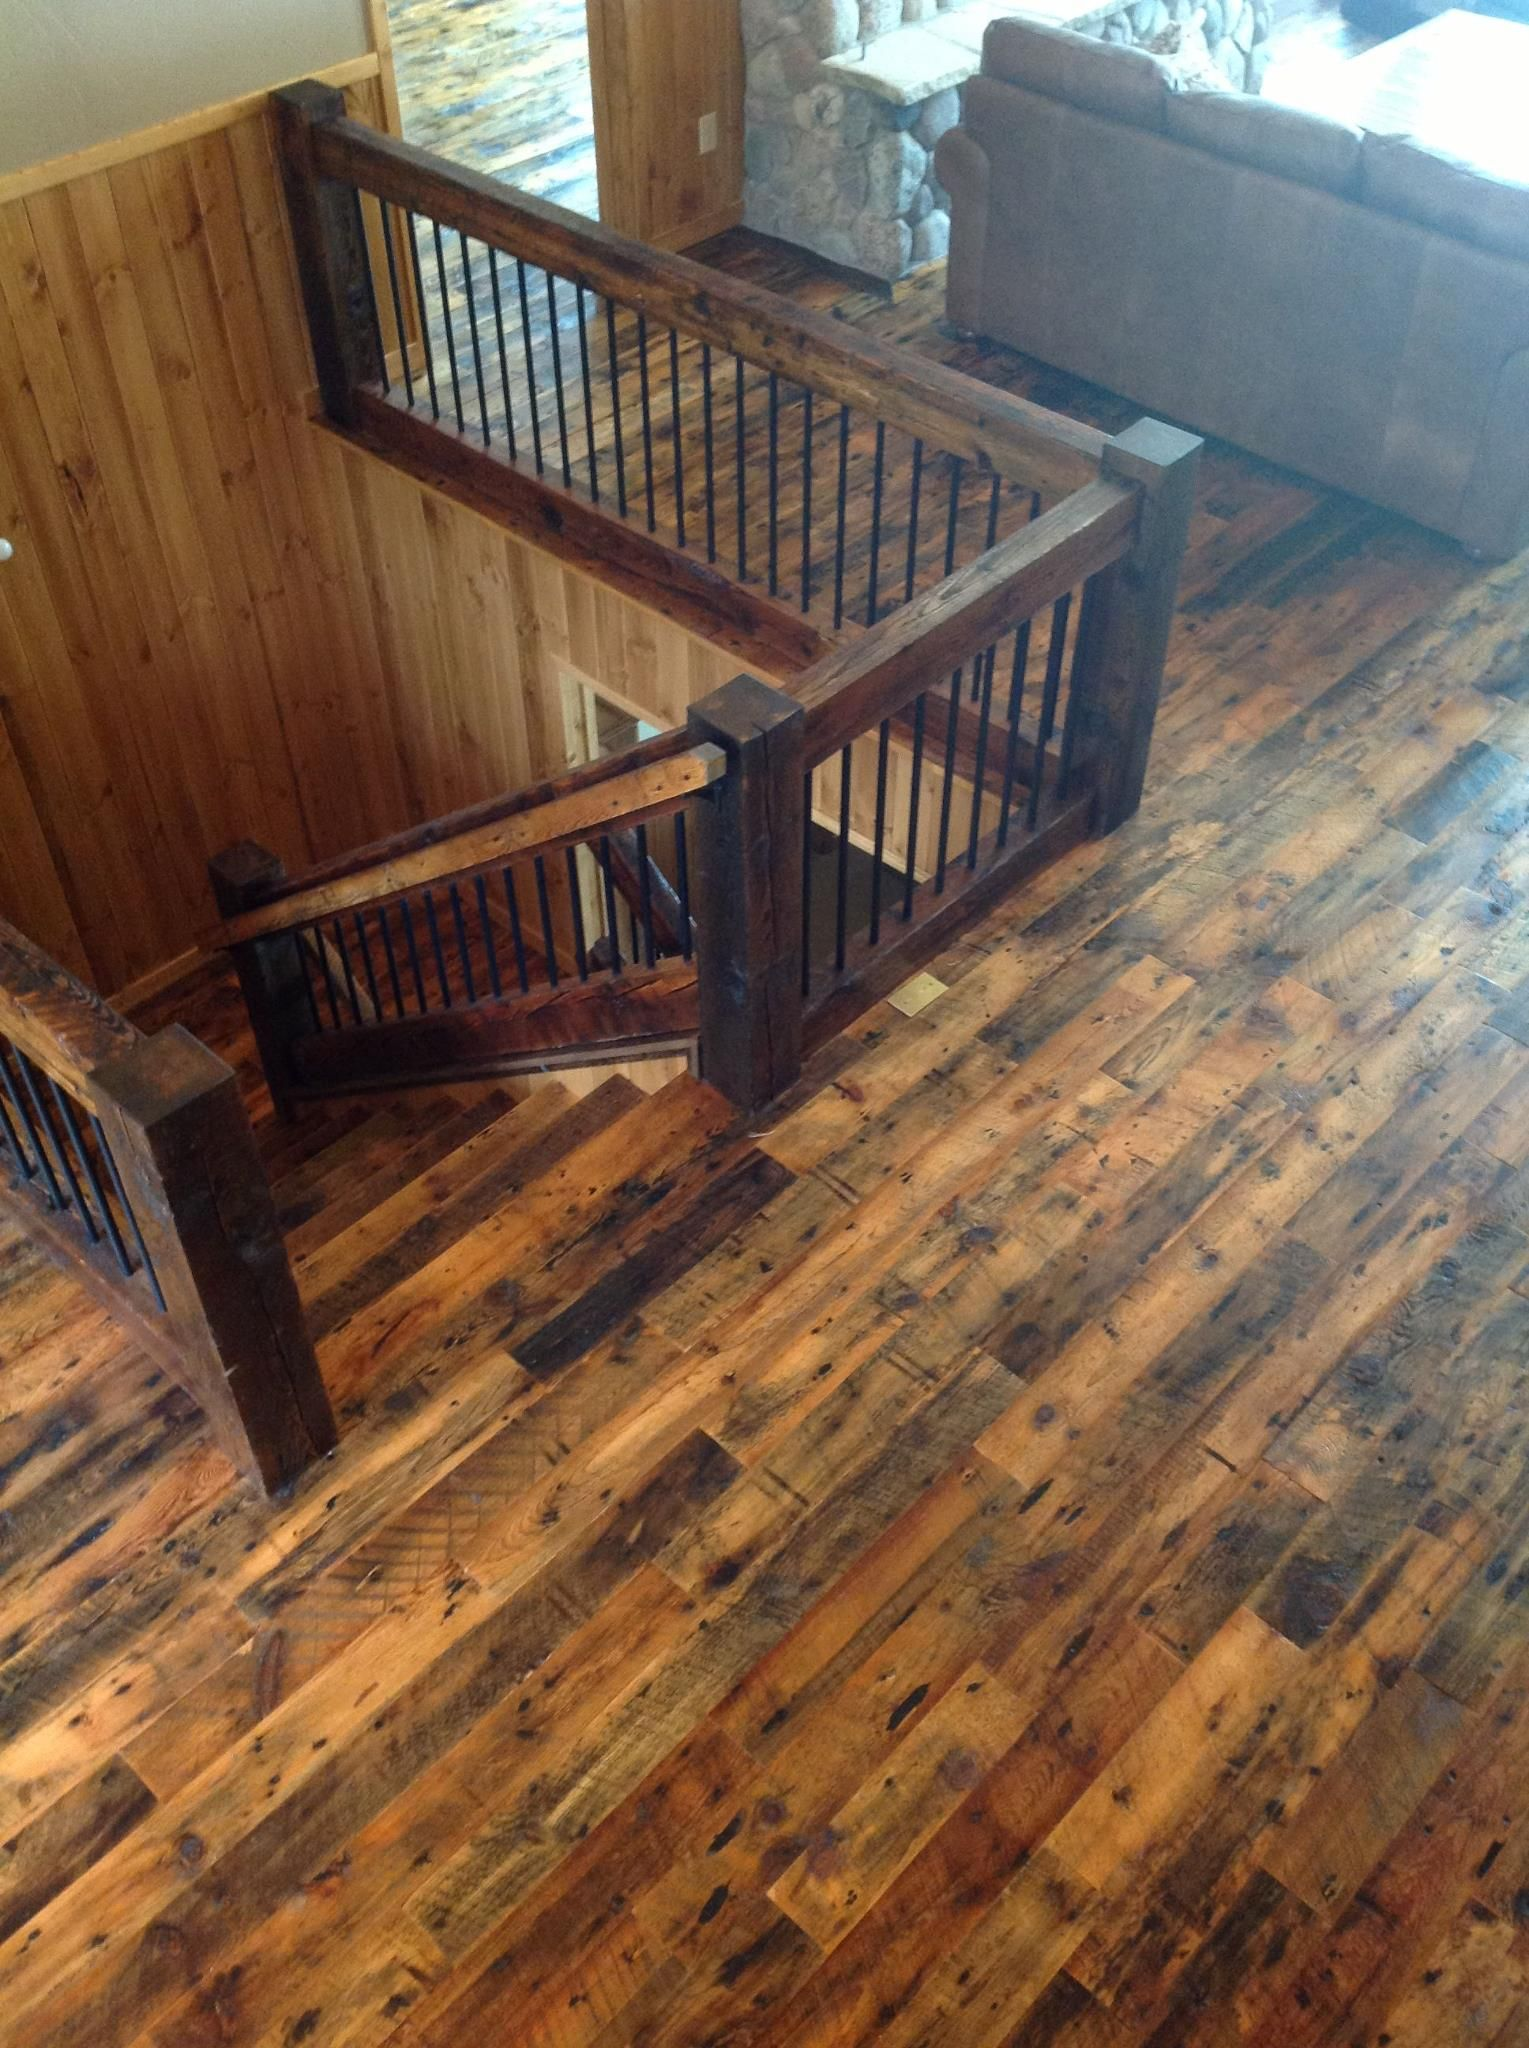 Rustic Mountian Stair Railings: Rustic, Simple Dark Newel Posts & Banister With